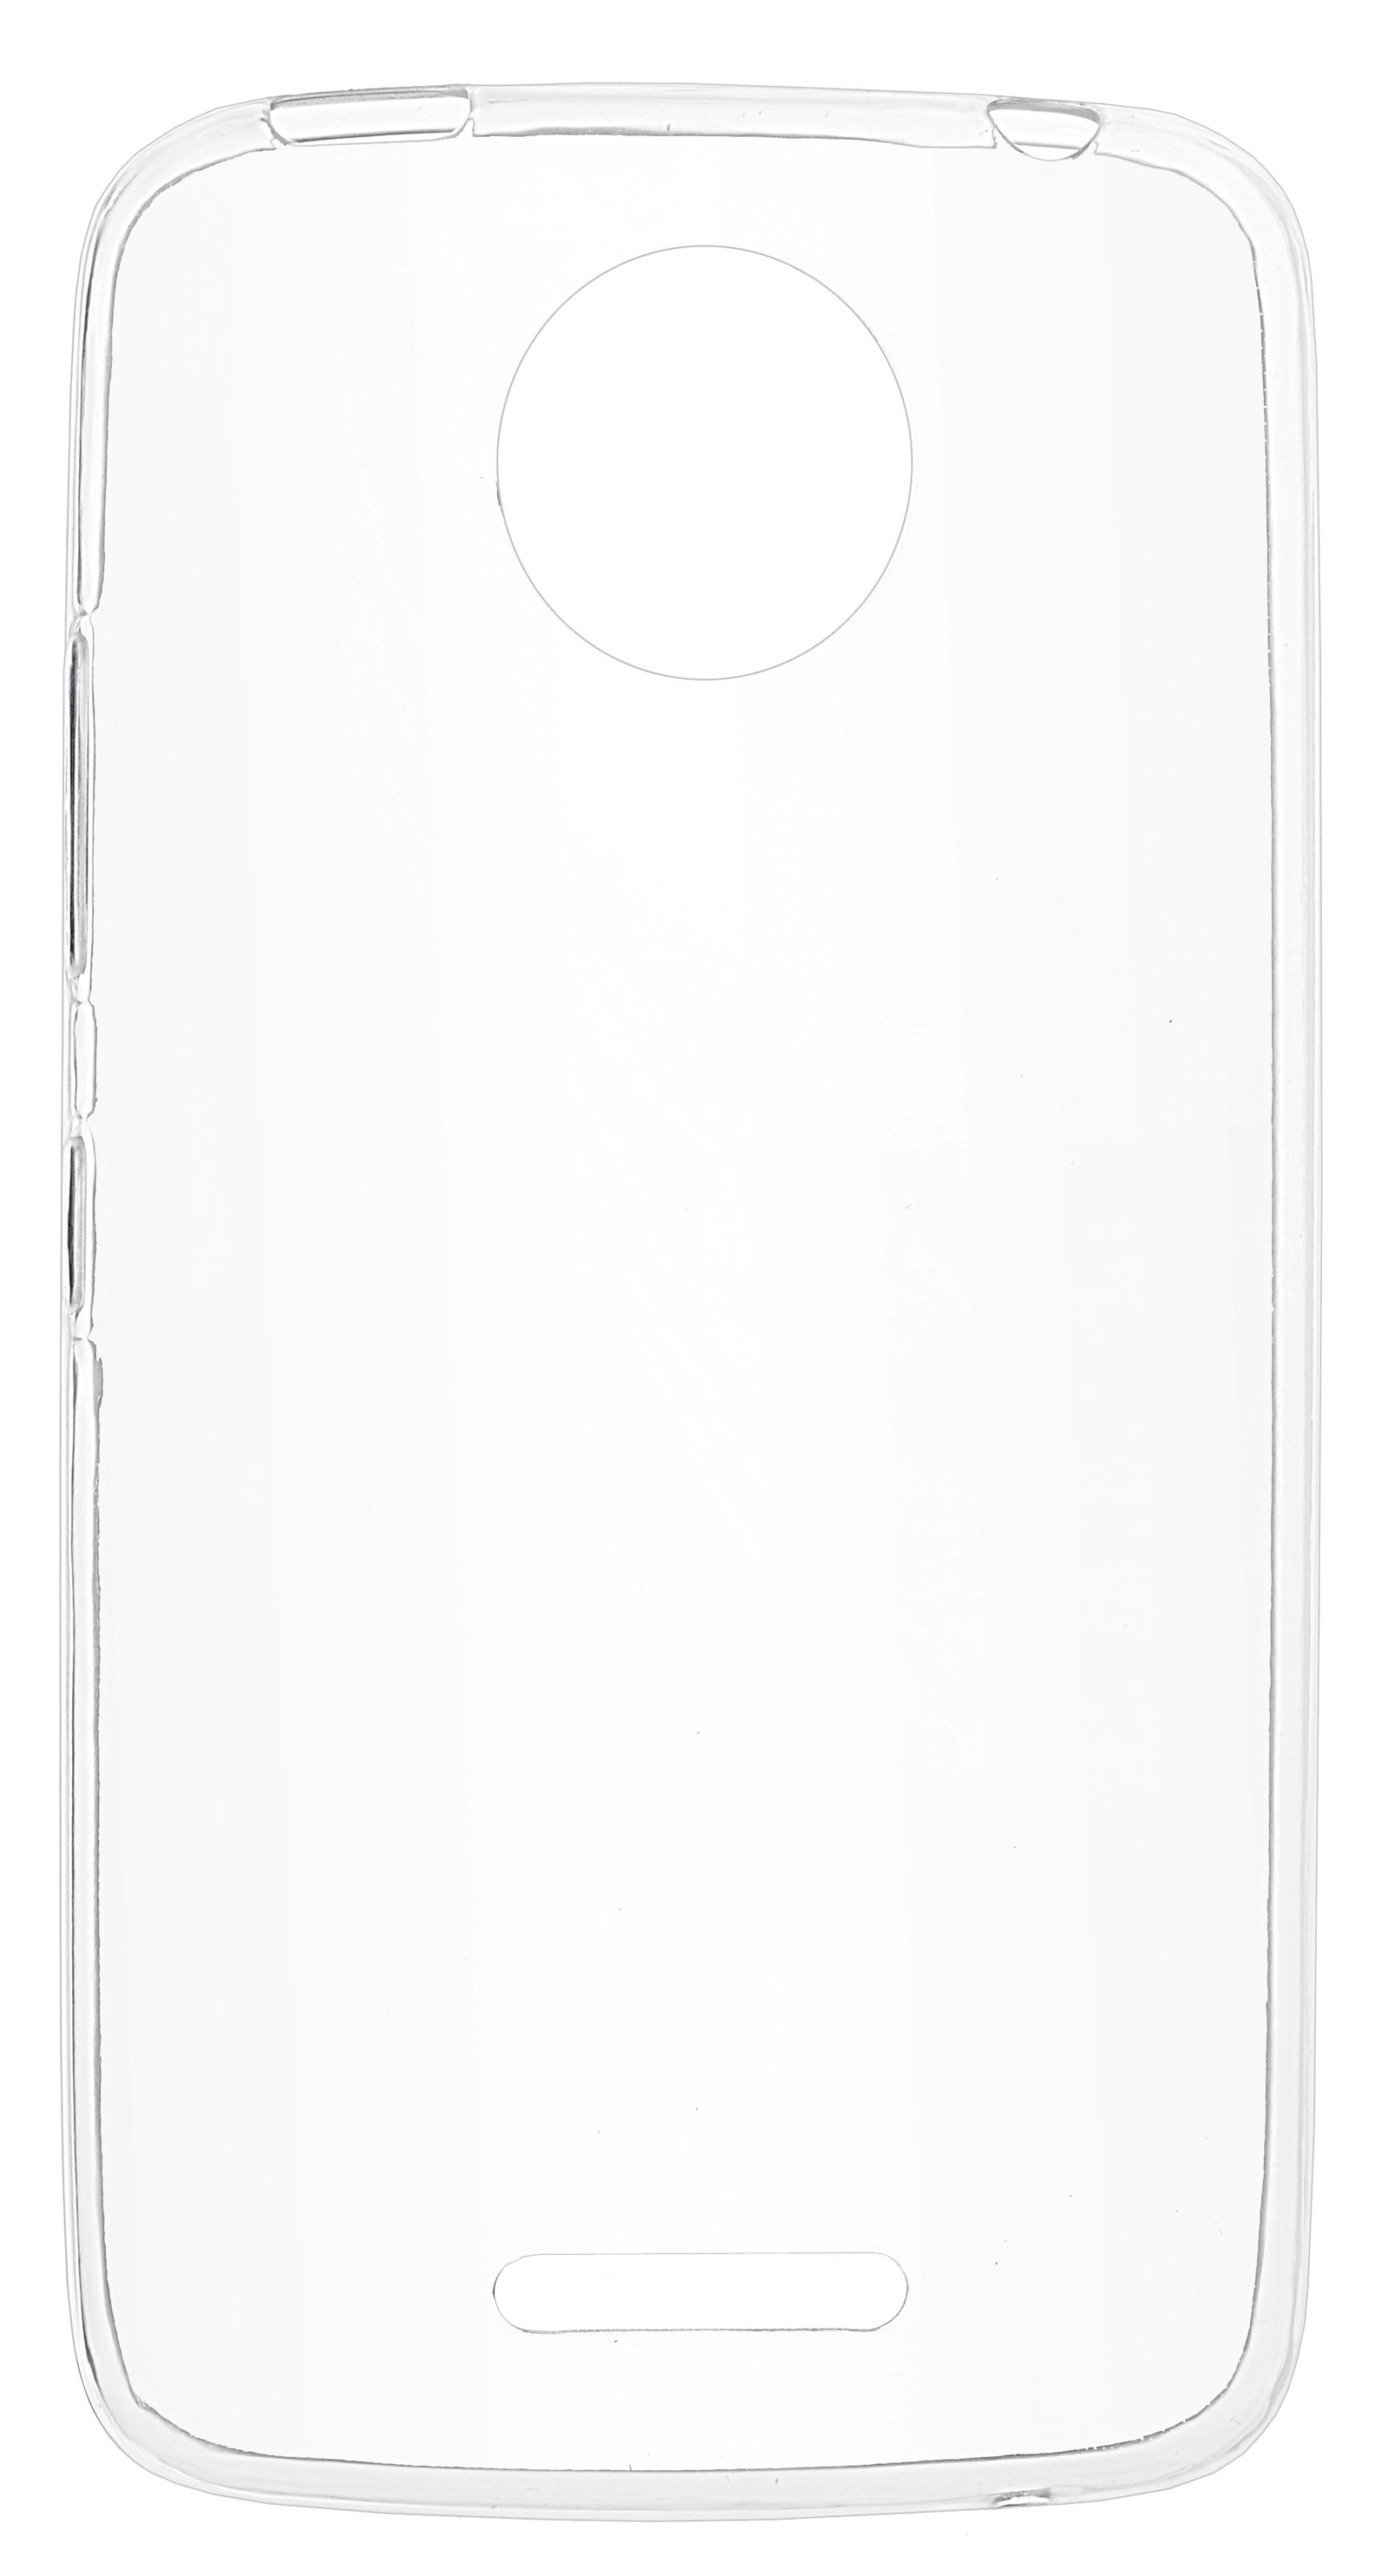 Чехол для сотового телефона skinBOX Slim Silicone, 4630042524415, прозрачный чехол для xiaomi redmi pro skinbox 4people slim silicone case прозрачный